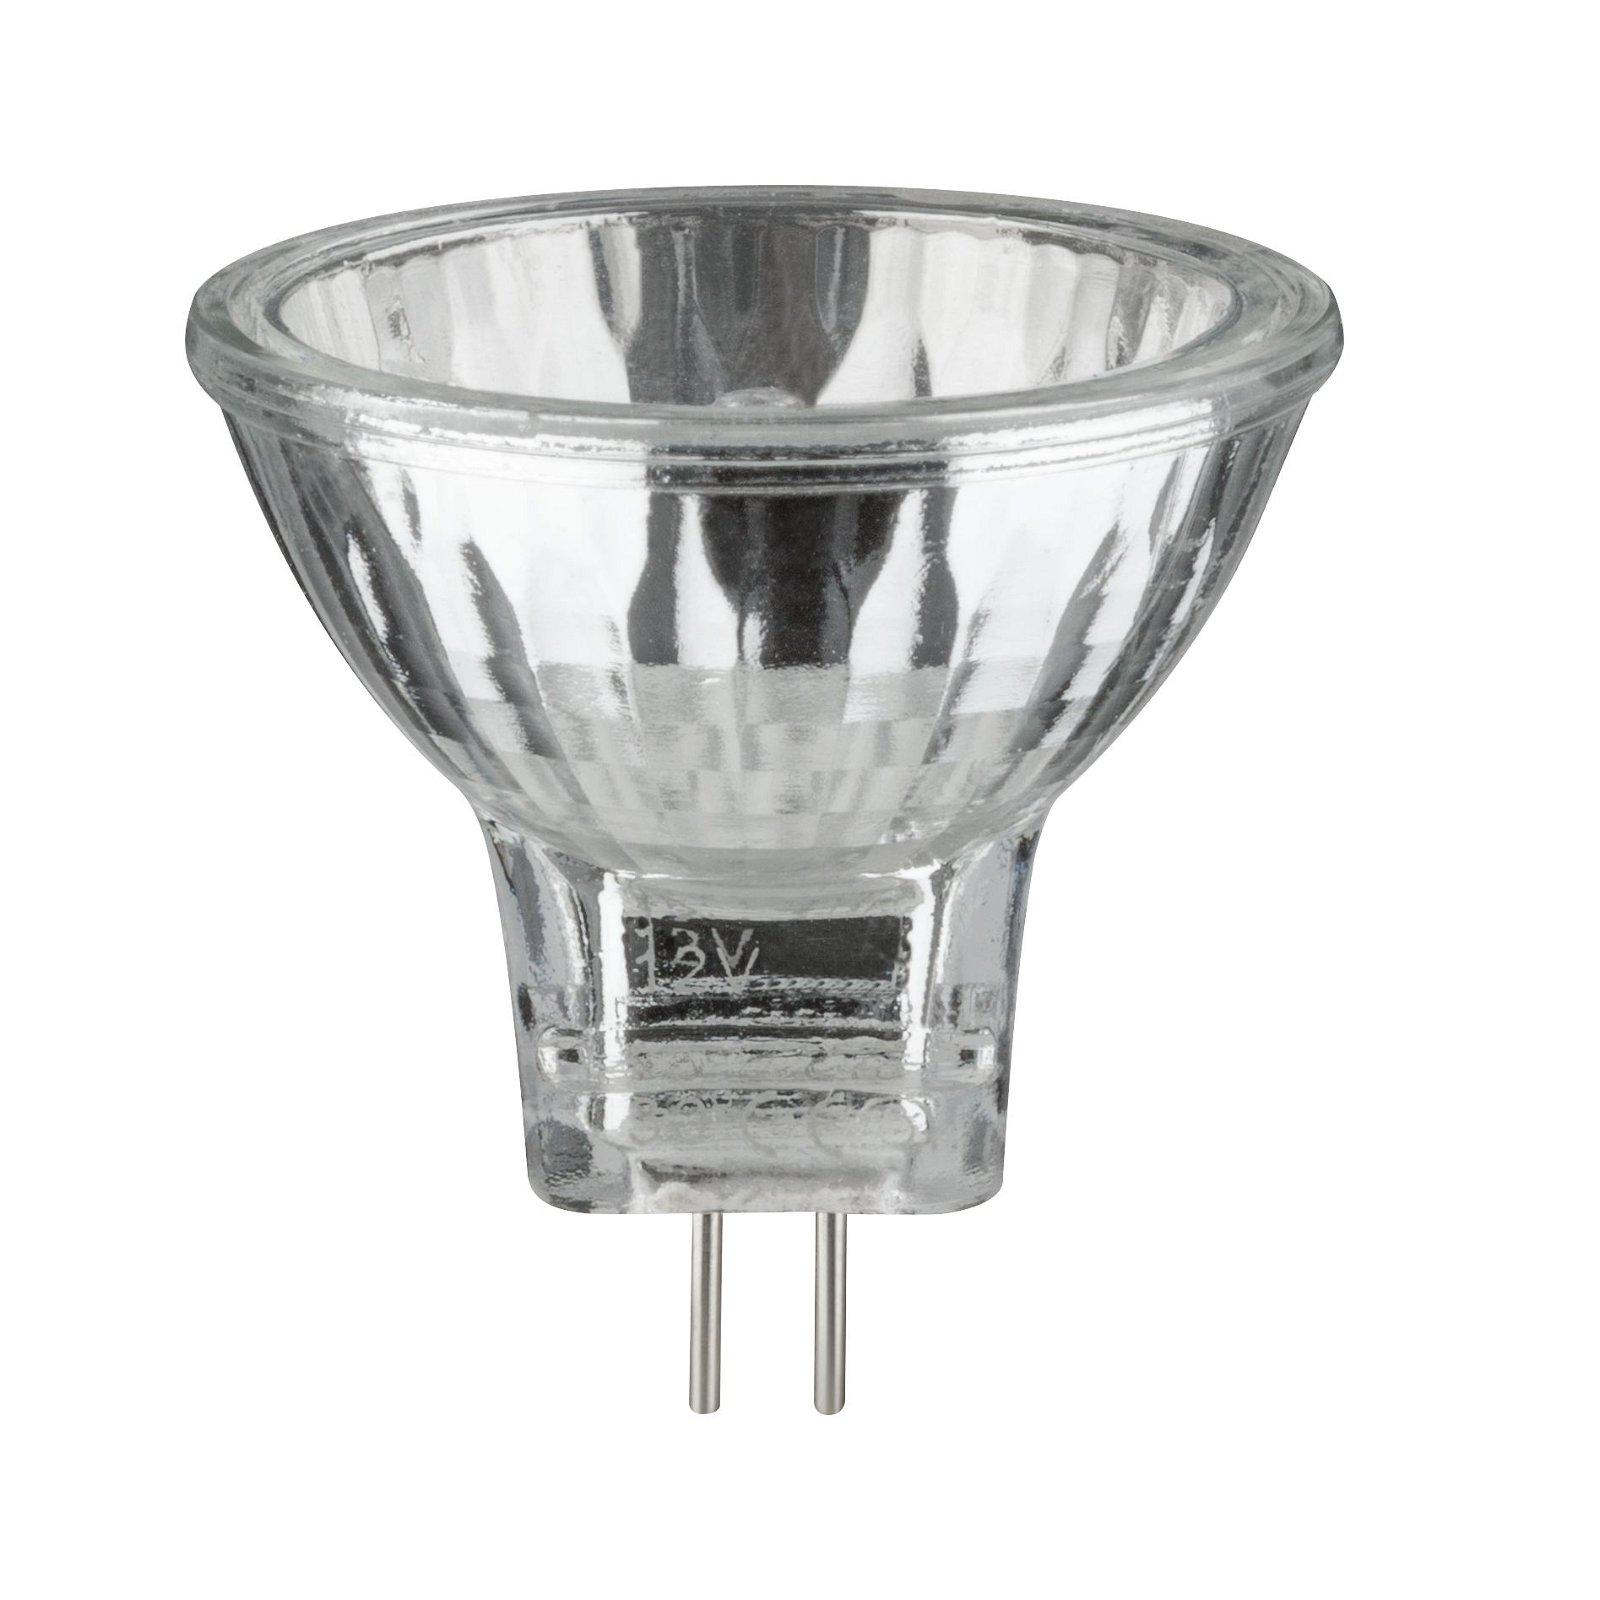 Halogen Reflektor Security 3er-Set Silber 3x35W GU4